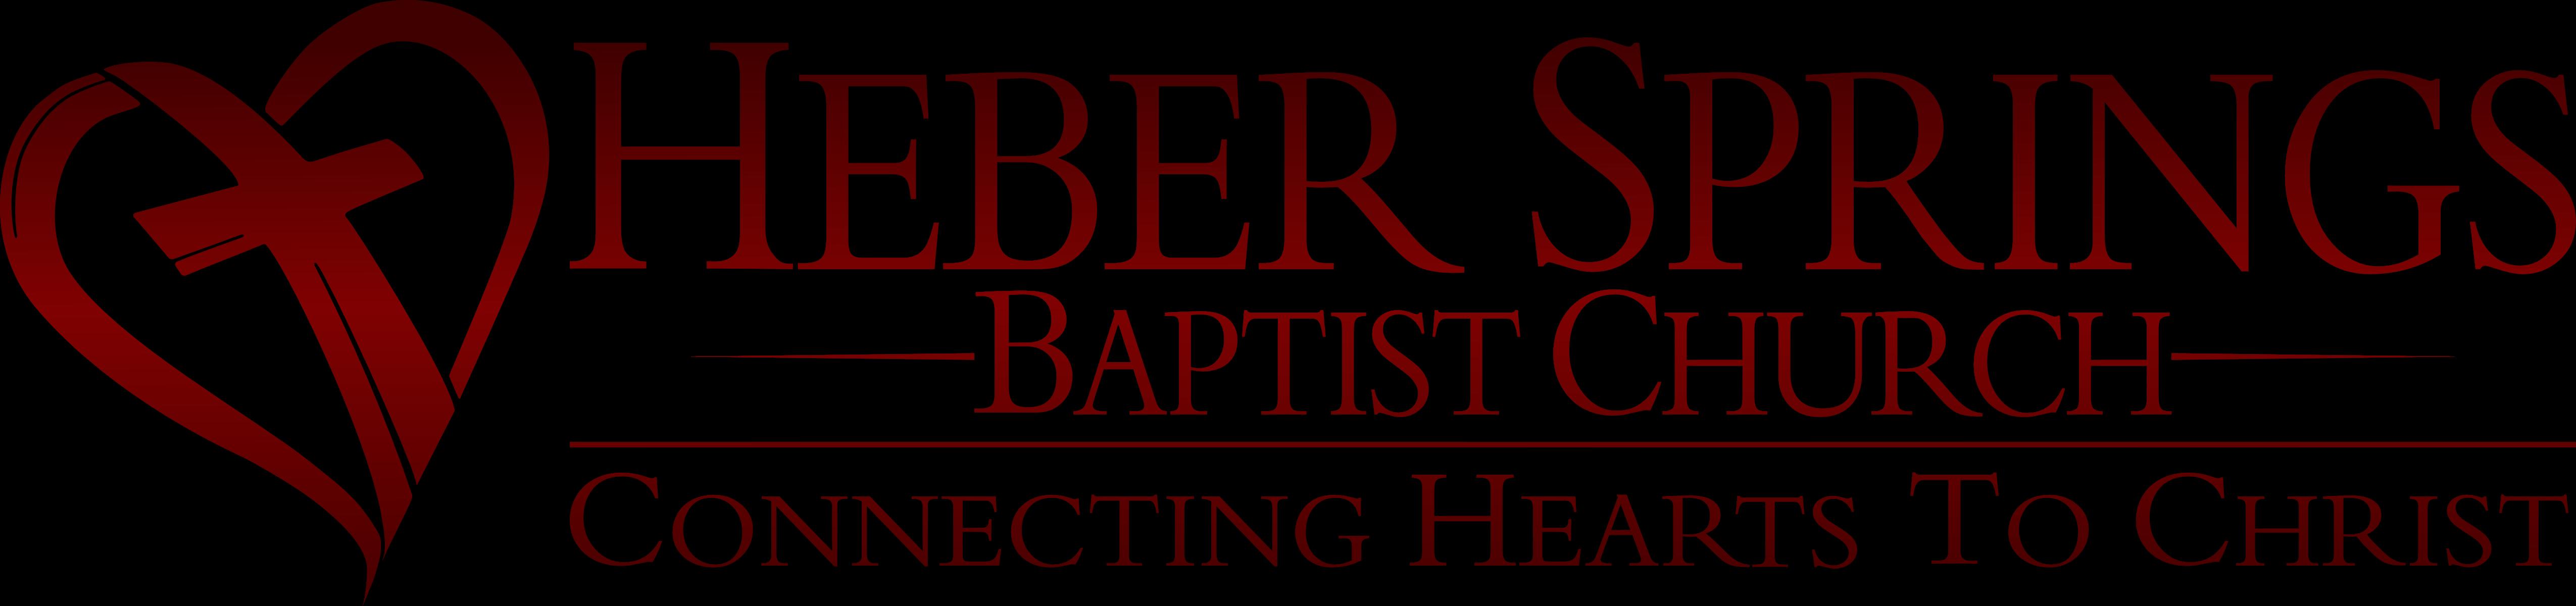 Heber Springs Baptist Church